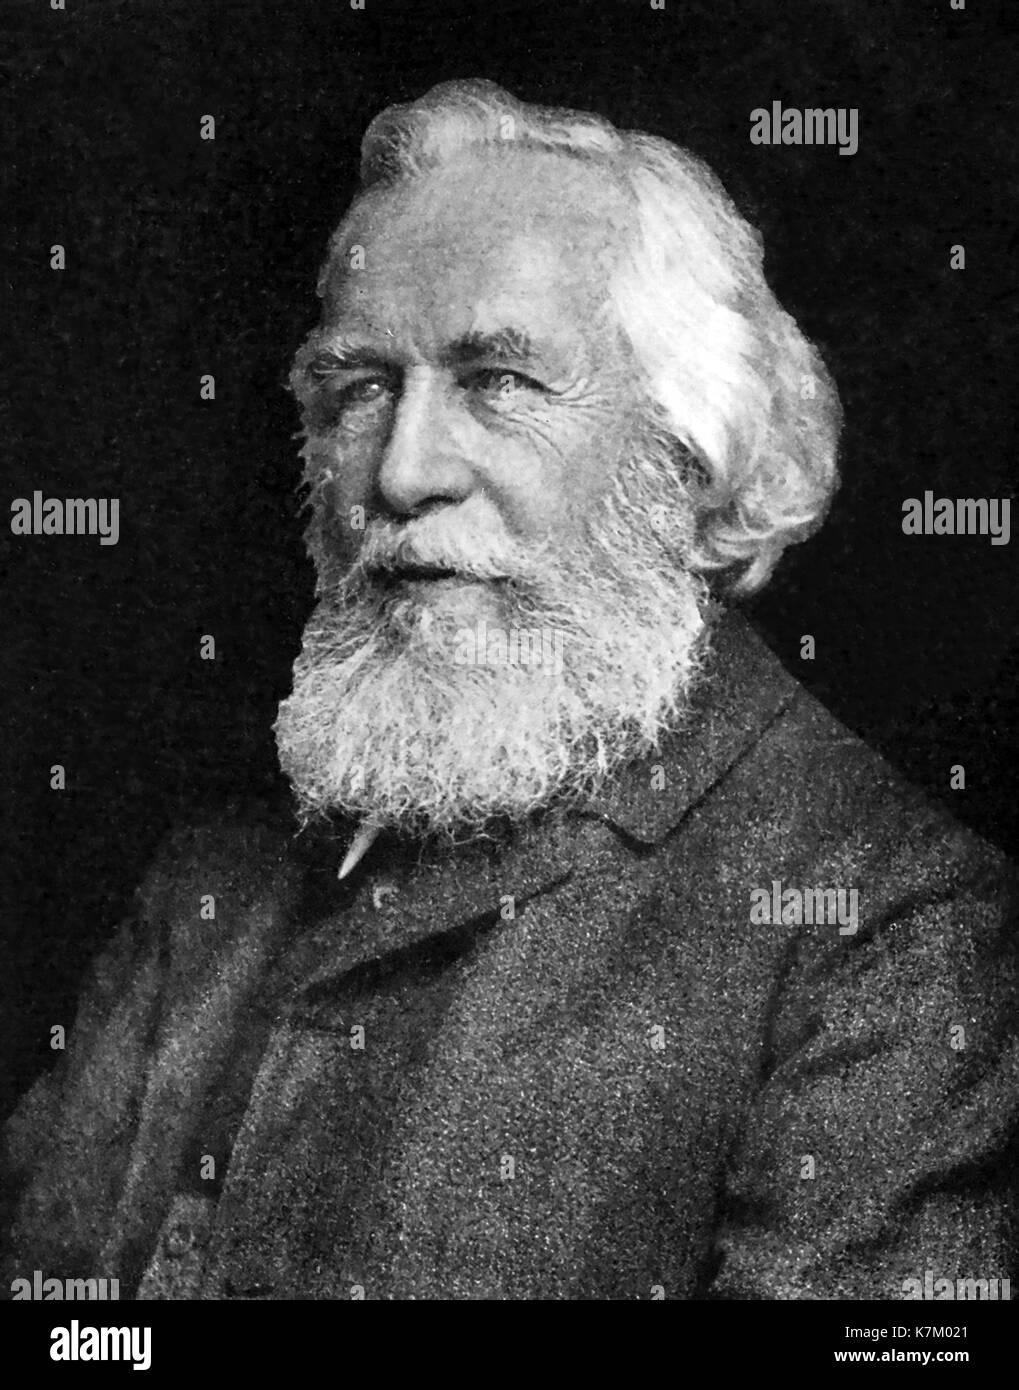 Ernst haeckel (1834-1919) tedesco biologo, medico naturalista, Immagini Stock